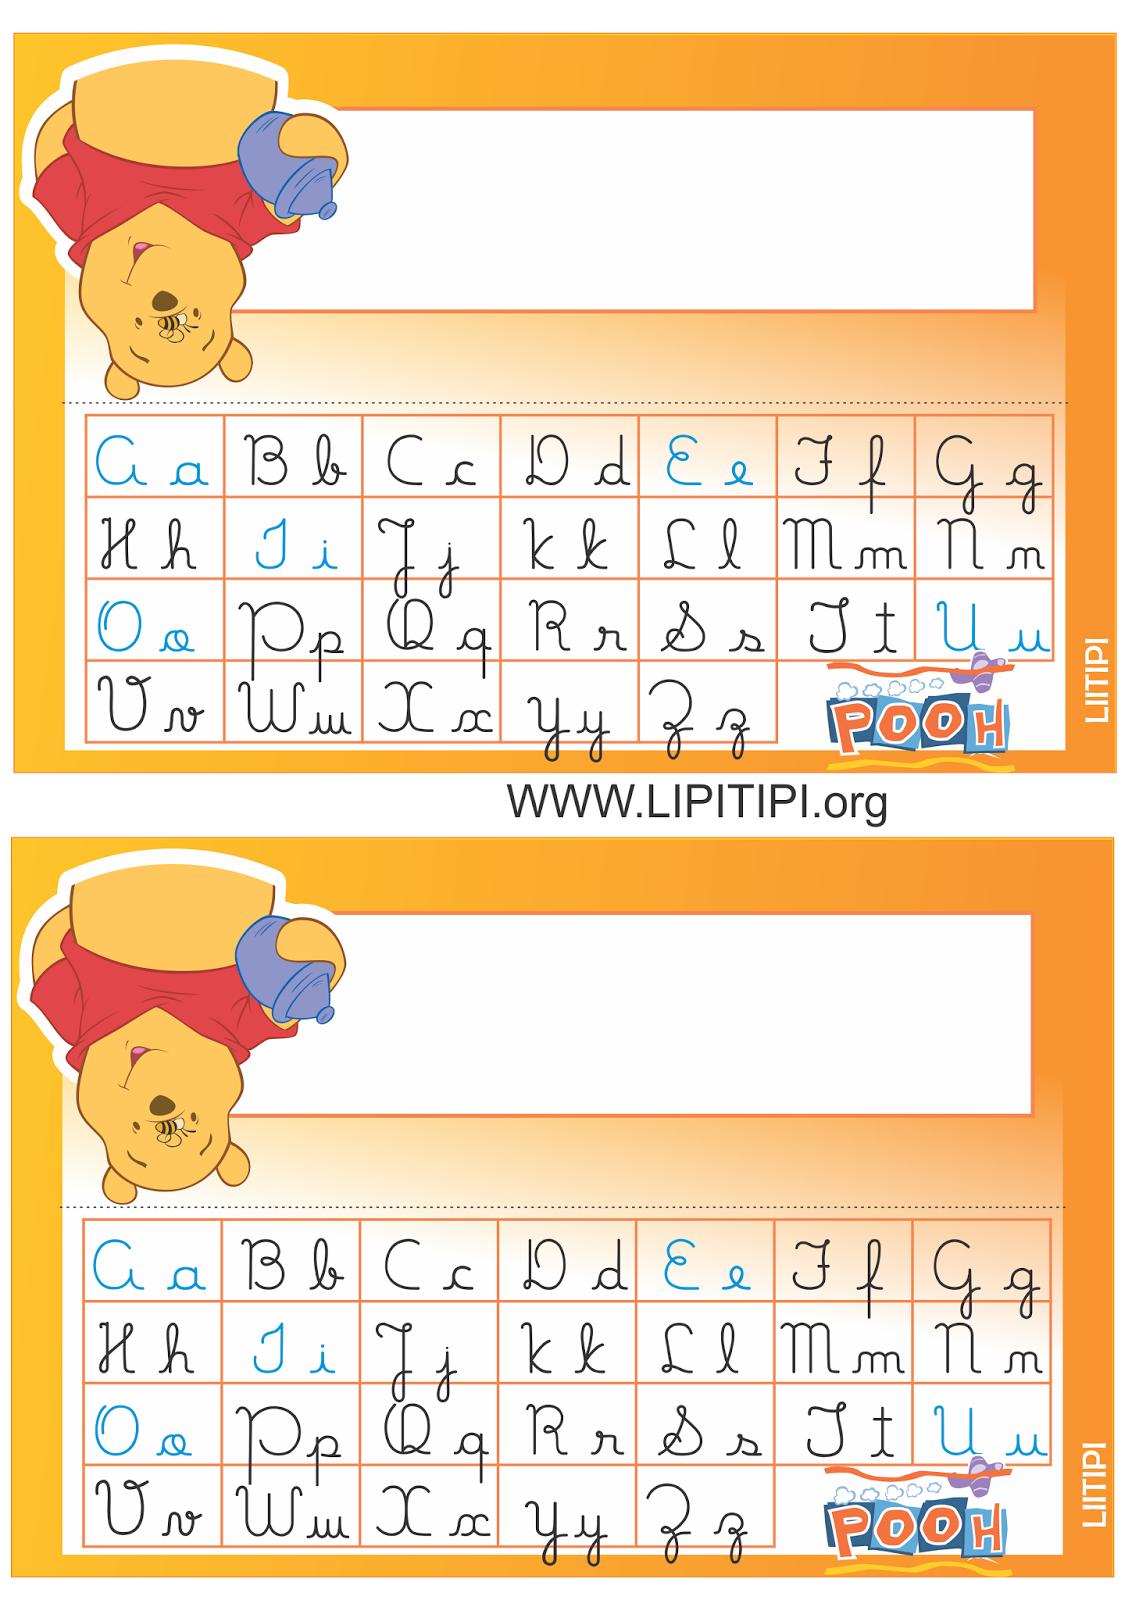 Fabuloso Lipitipi- Atividades e Projetos Fundamental I: Crachás de mesa com  QS02